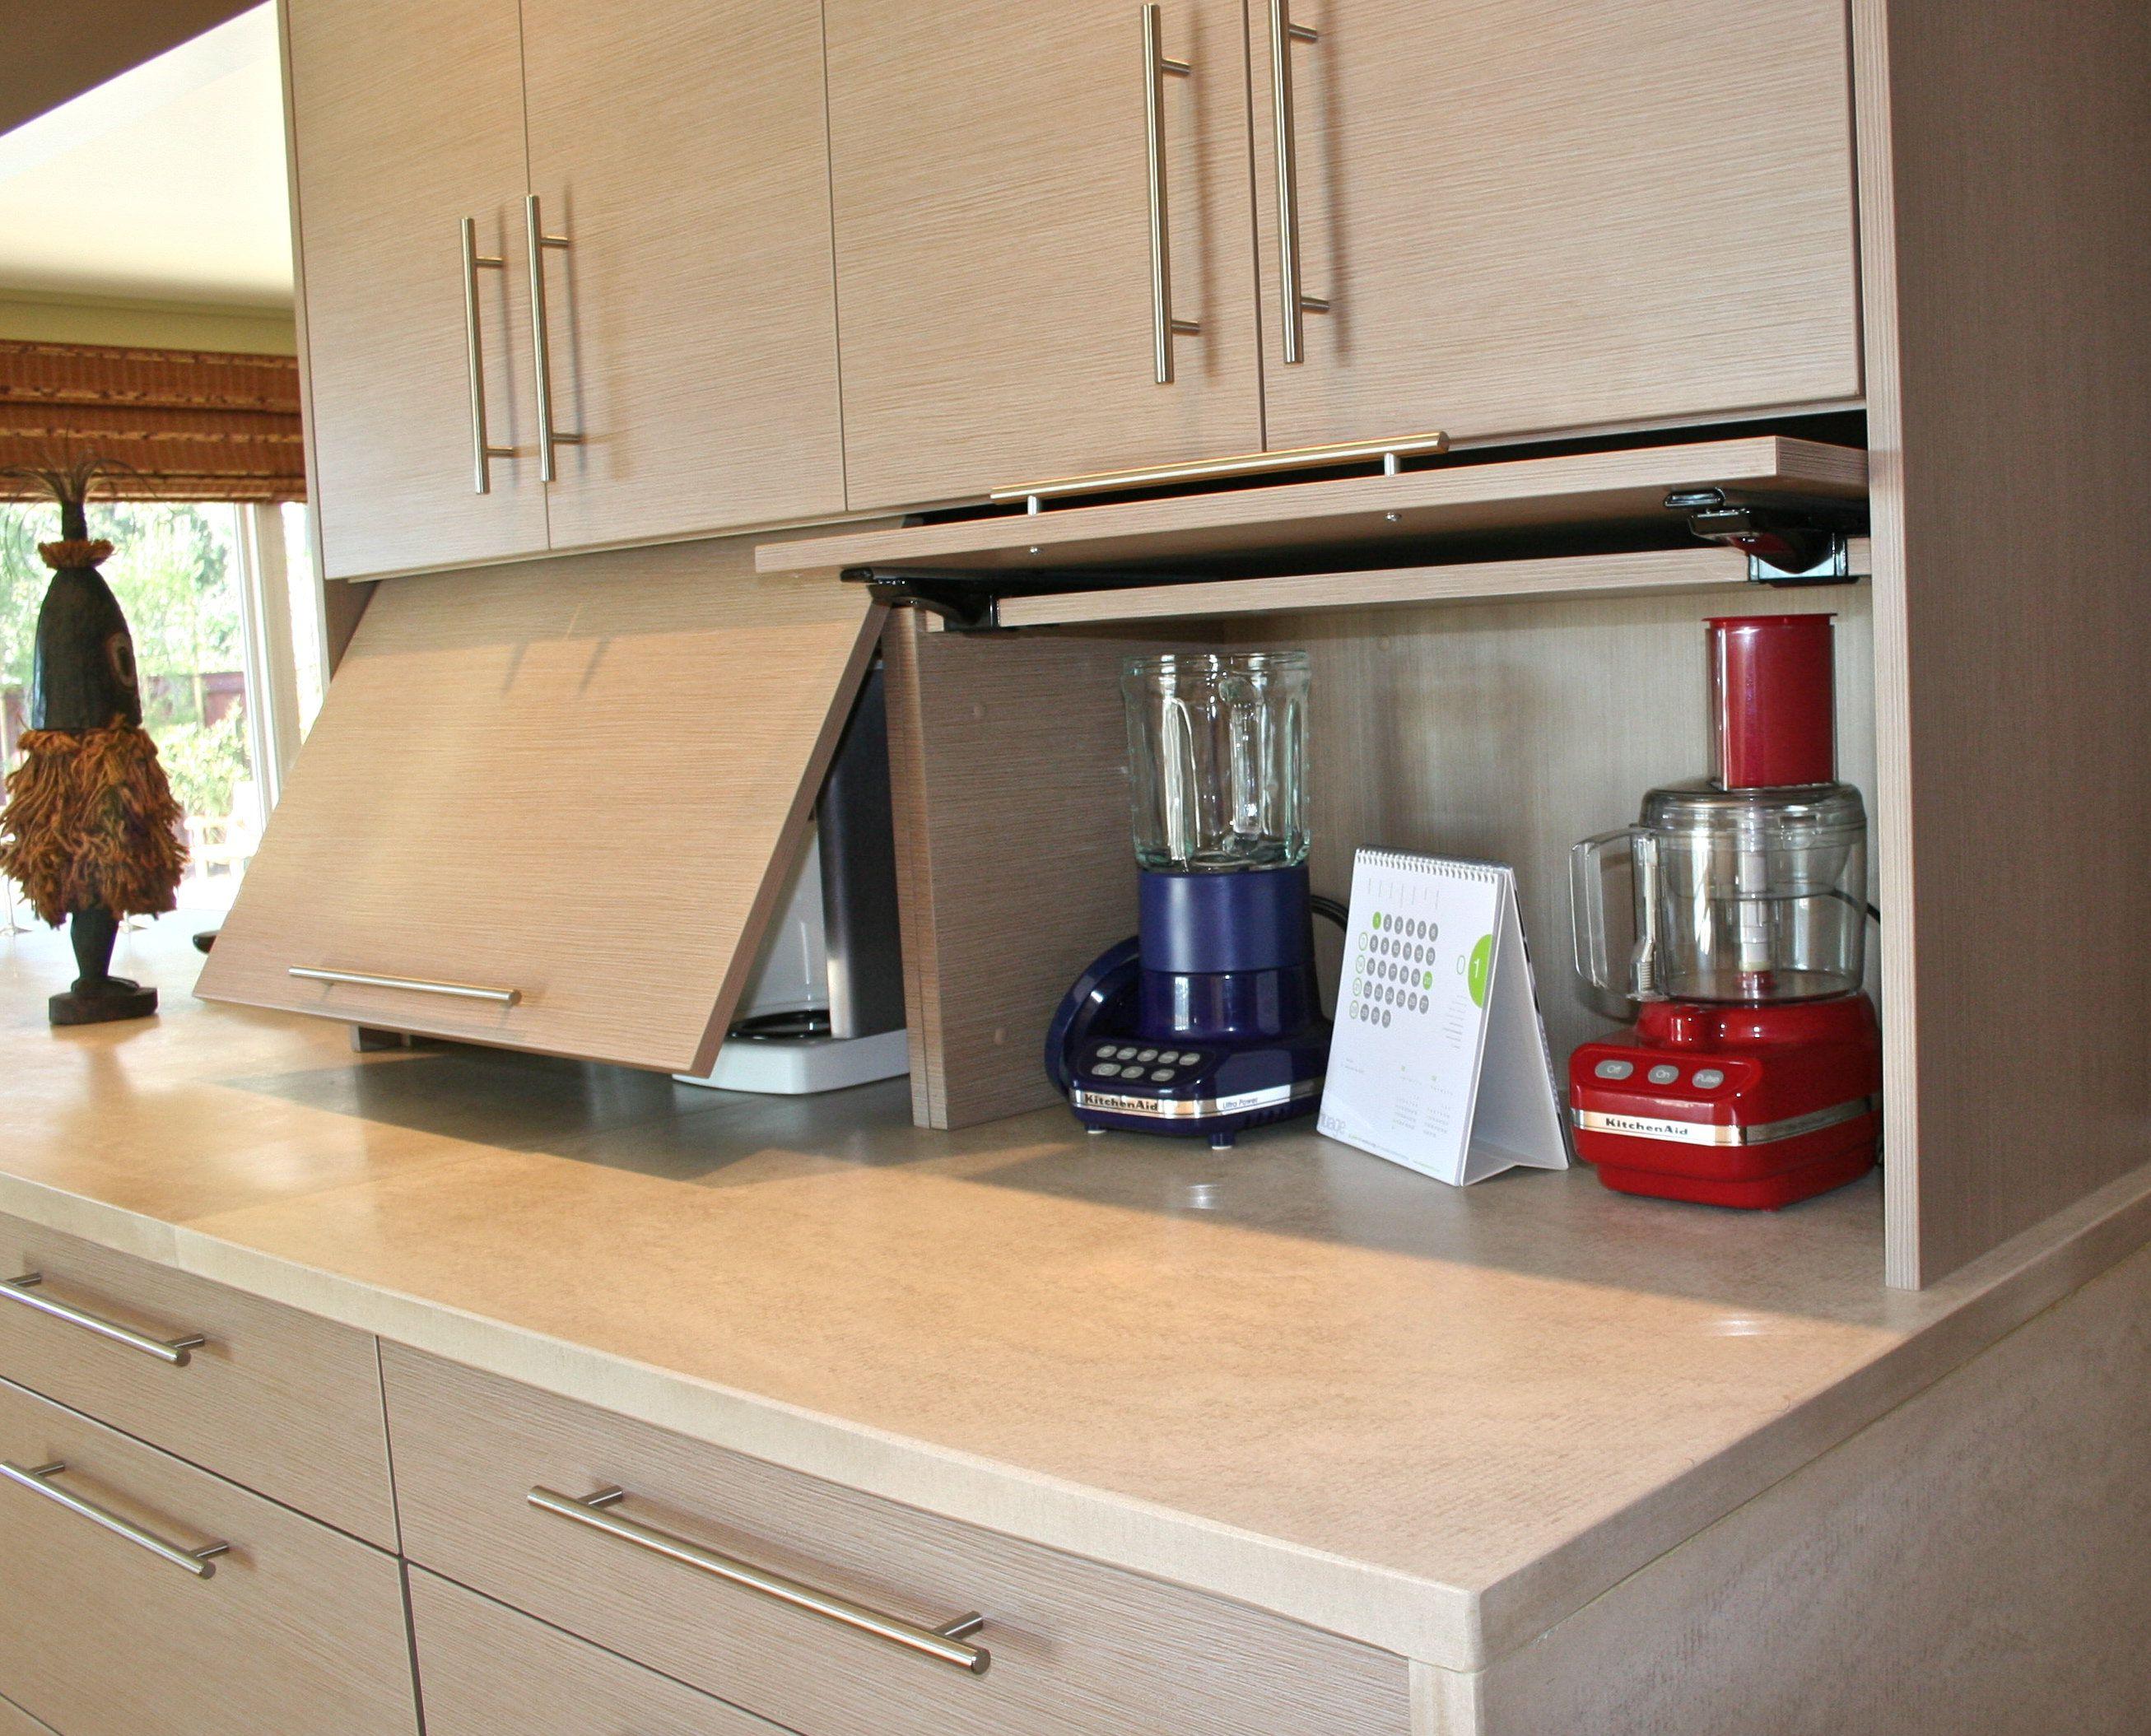 Küche Appliance Schrank Tür Roller  Remodelacion de cocinas